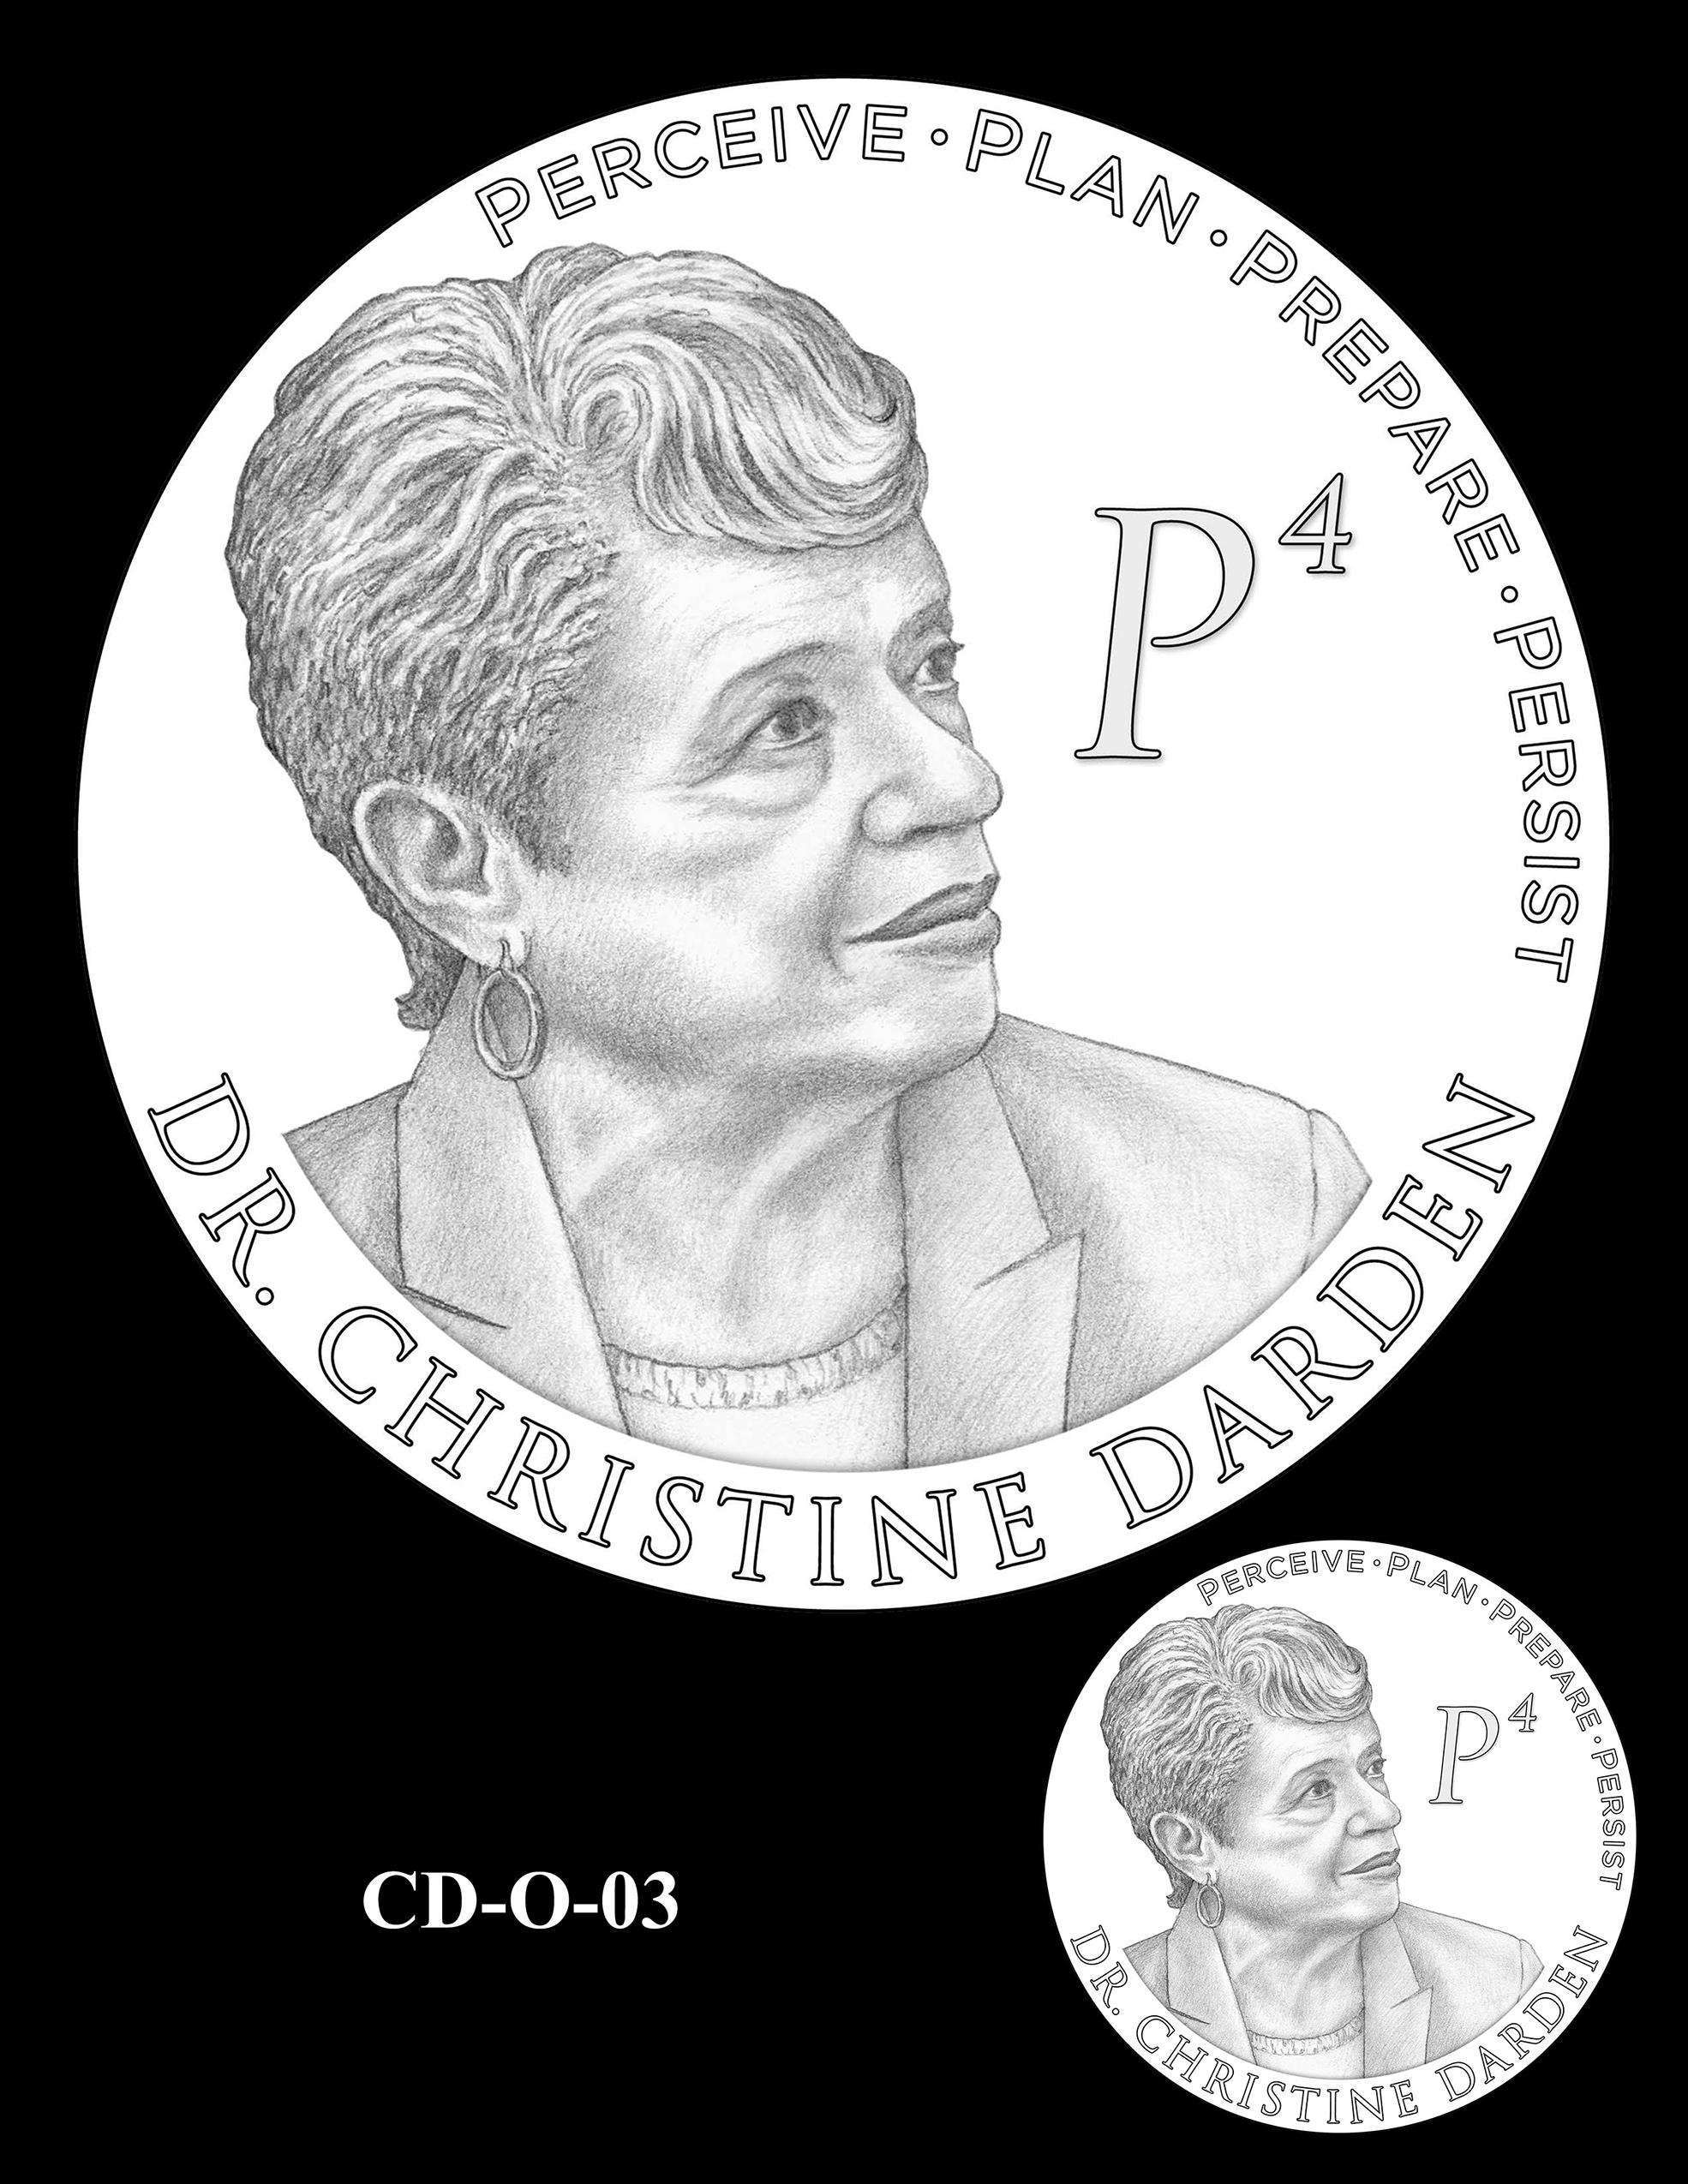 CD-O-03 -- Dr. Christine Darden Congressional Gold Medal